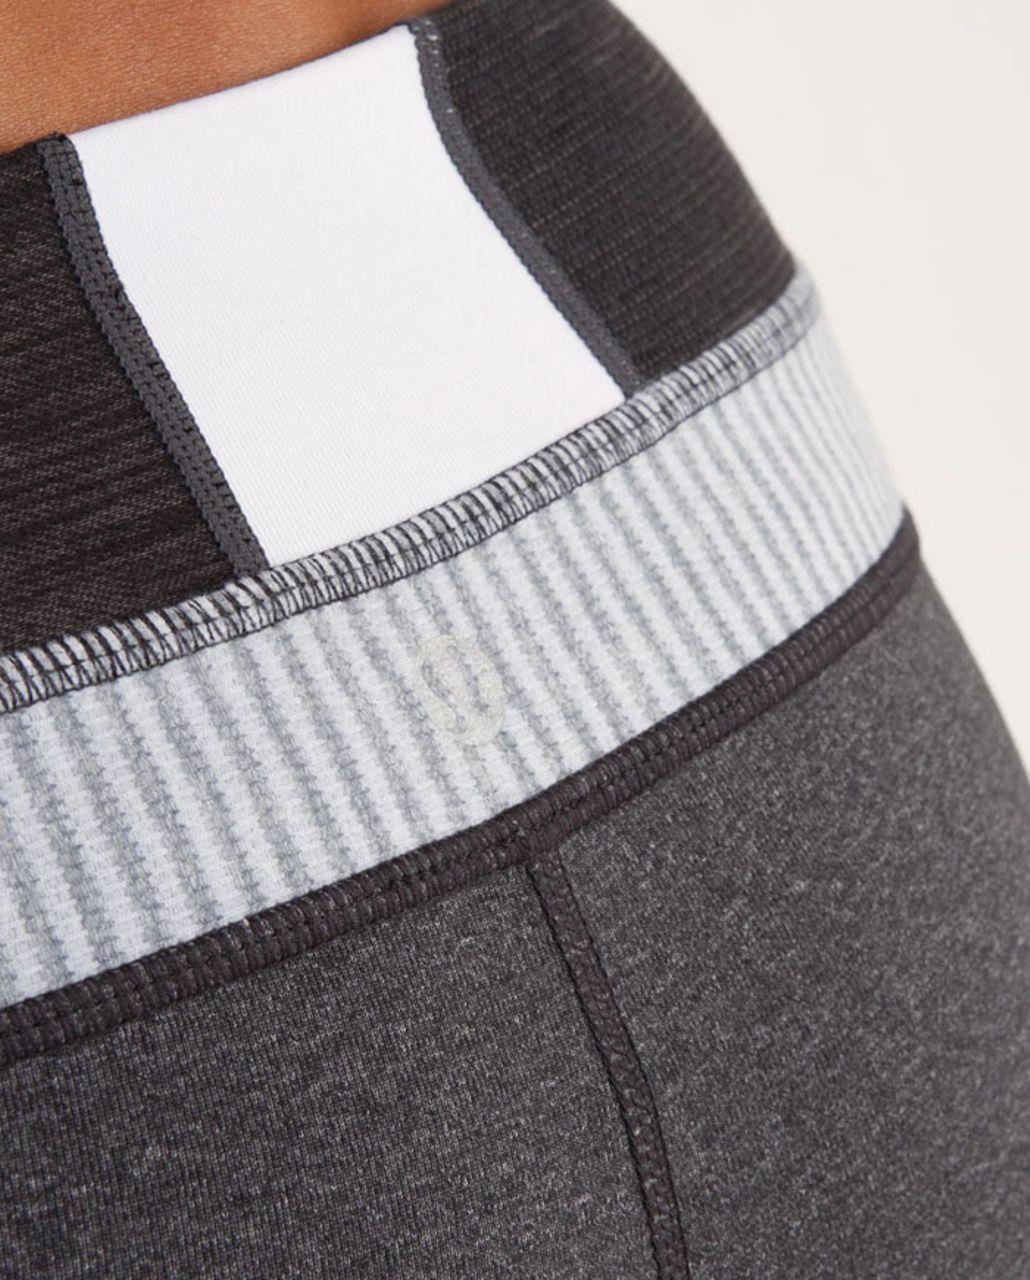 Lululemon Groove Short - Heathered Deep Coal /  Quilting Winter 4 /  White Heathered Blurred Grey Mini Check